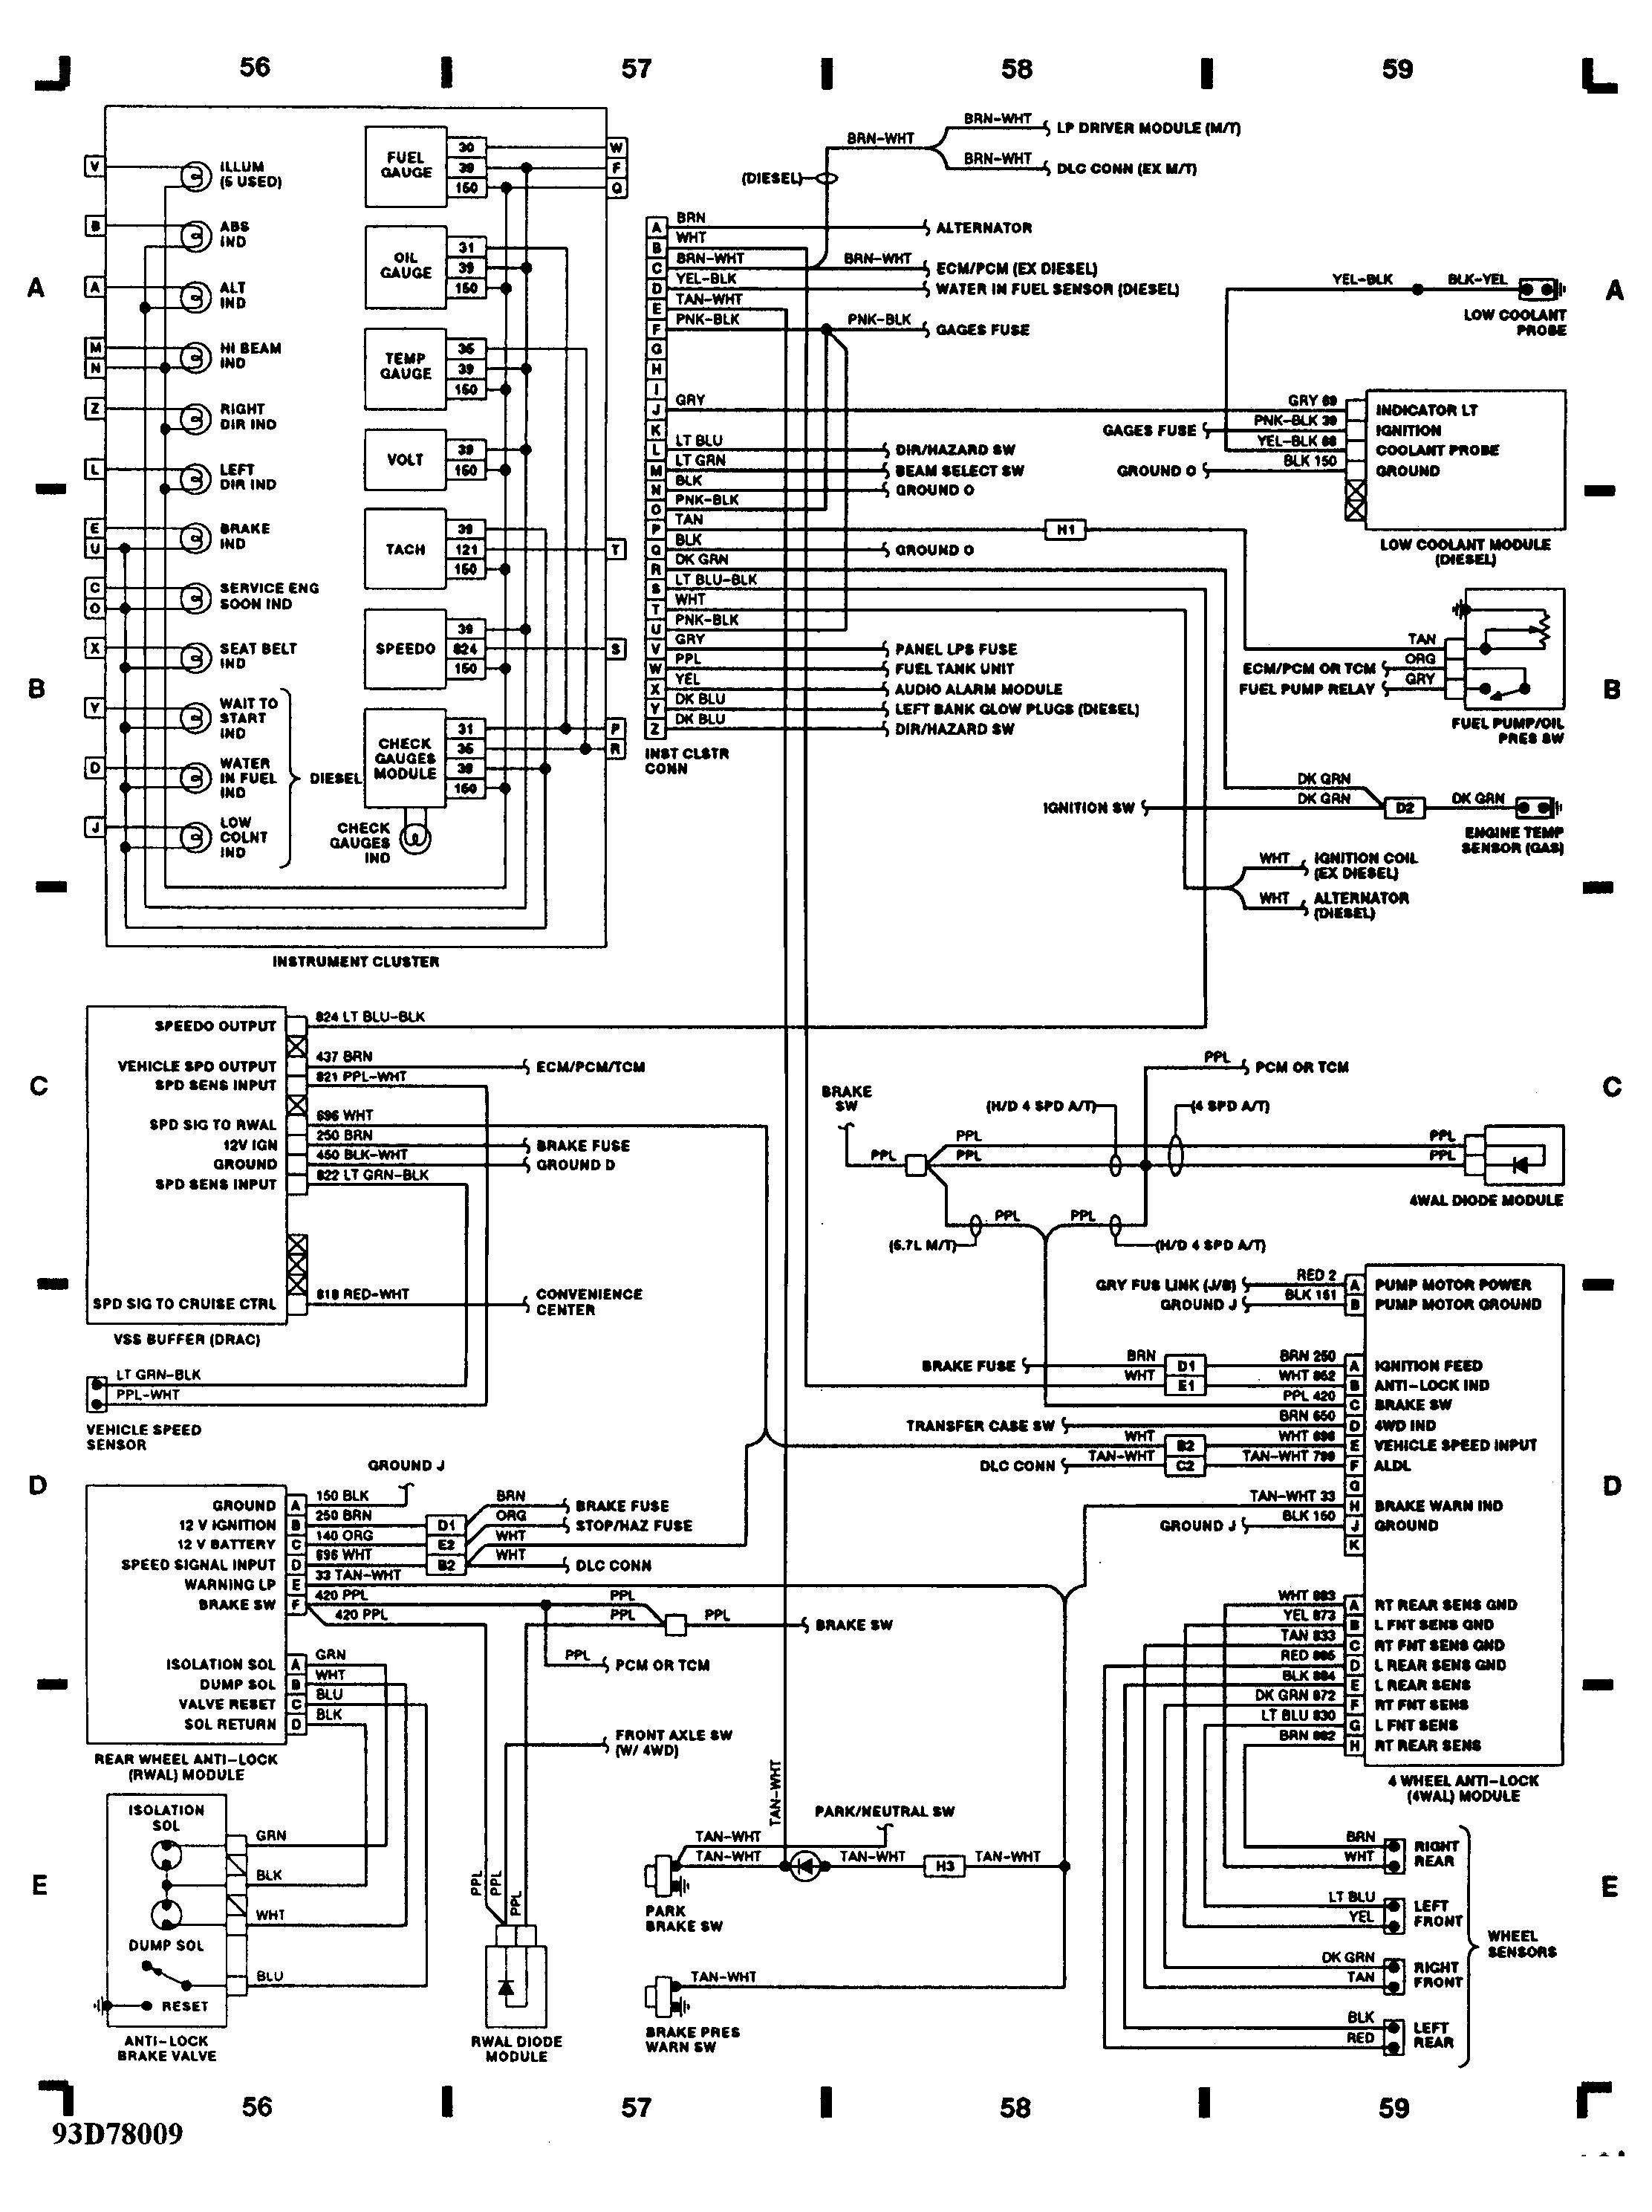 2007 Toyota Camry Radio Wiring Diagram from detoxicrecenze.com